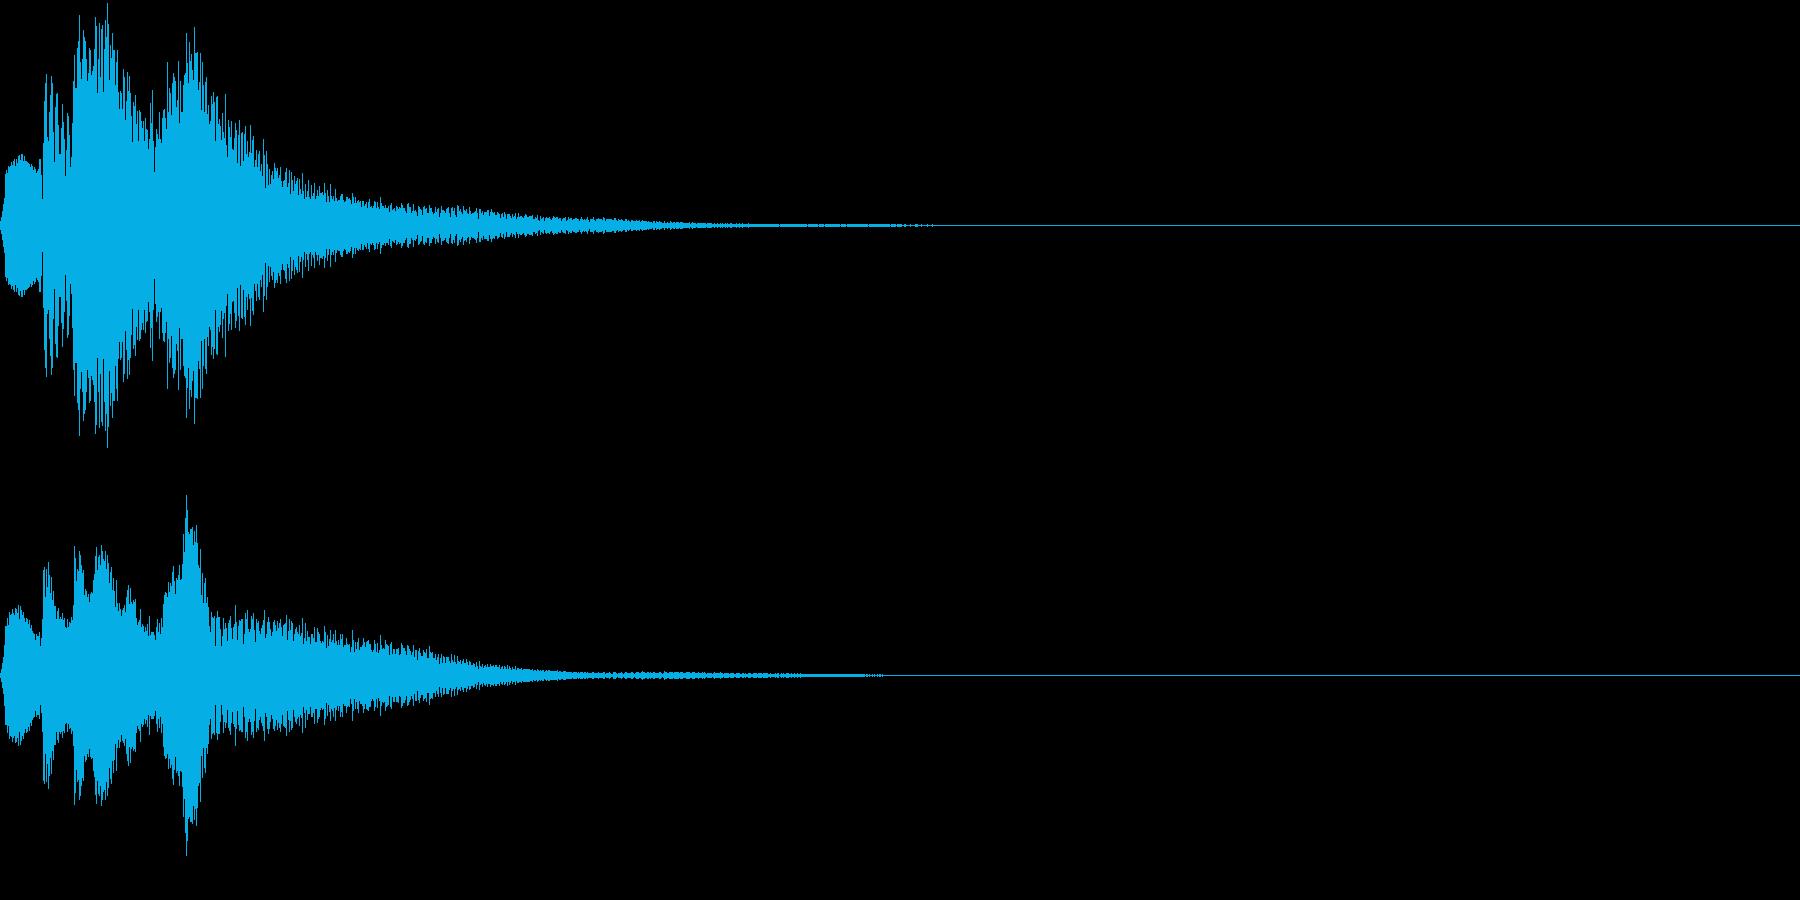 理科 化学 実験 変化 不思議 08の再生済みの波形